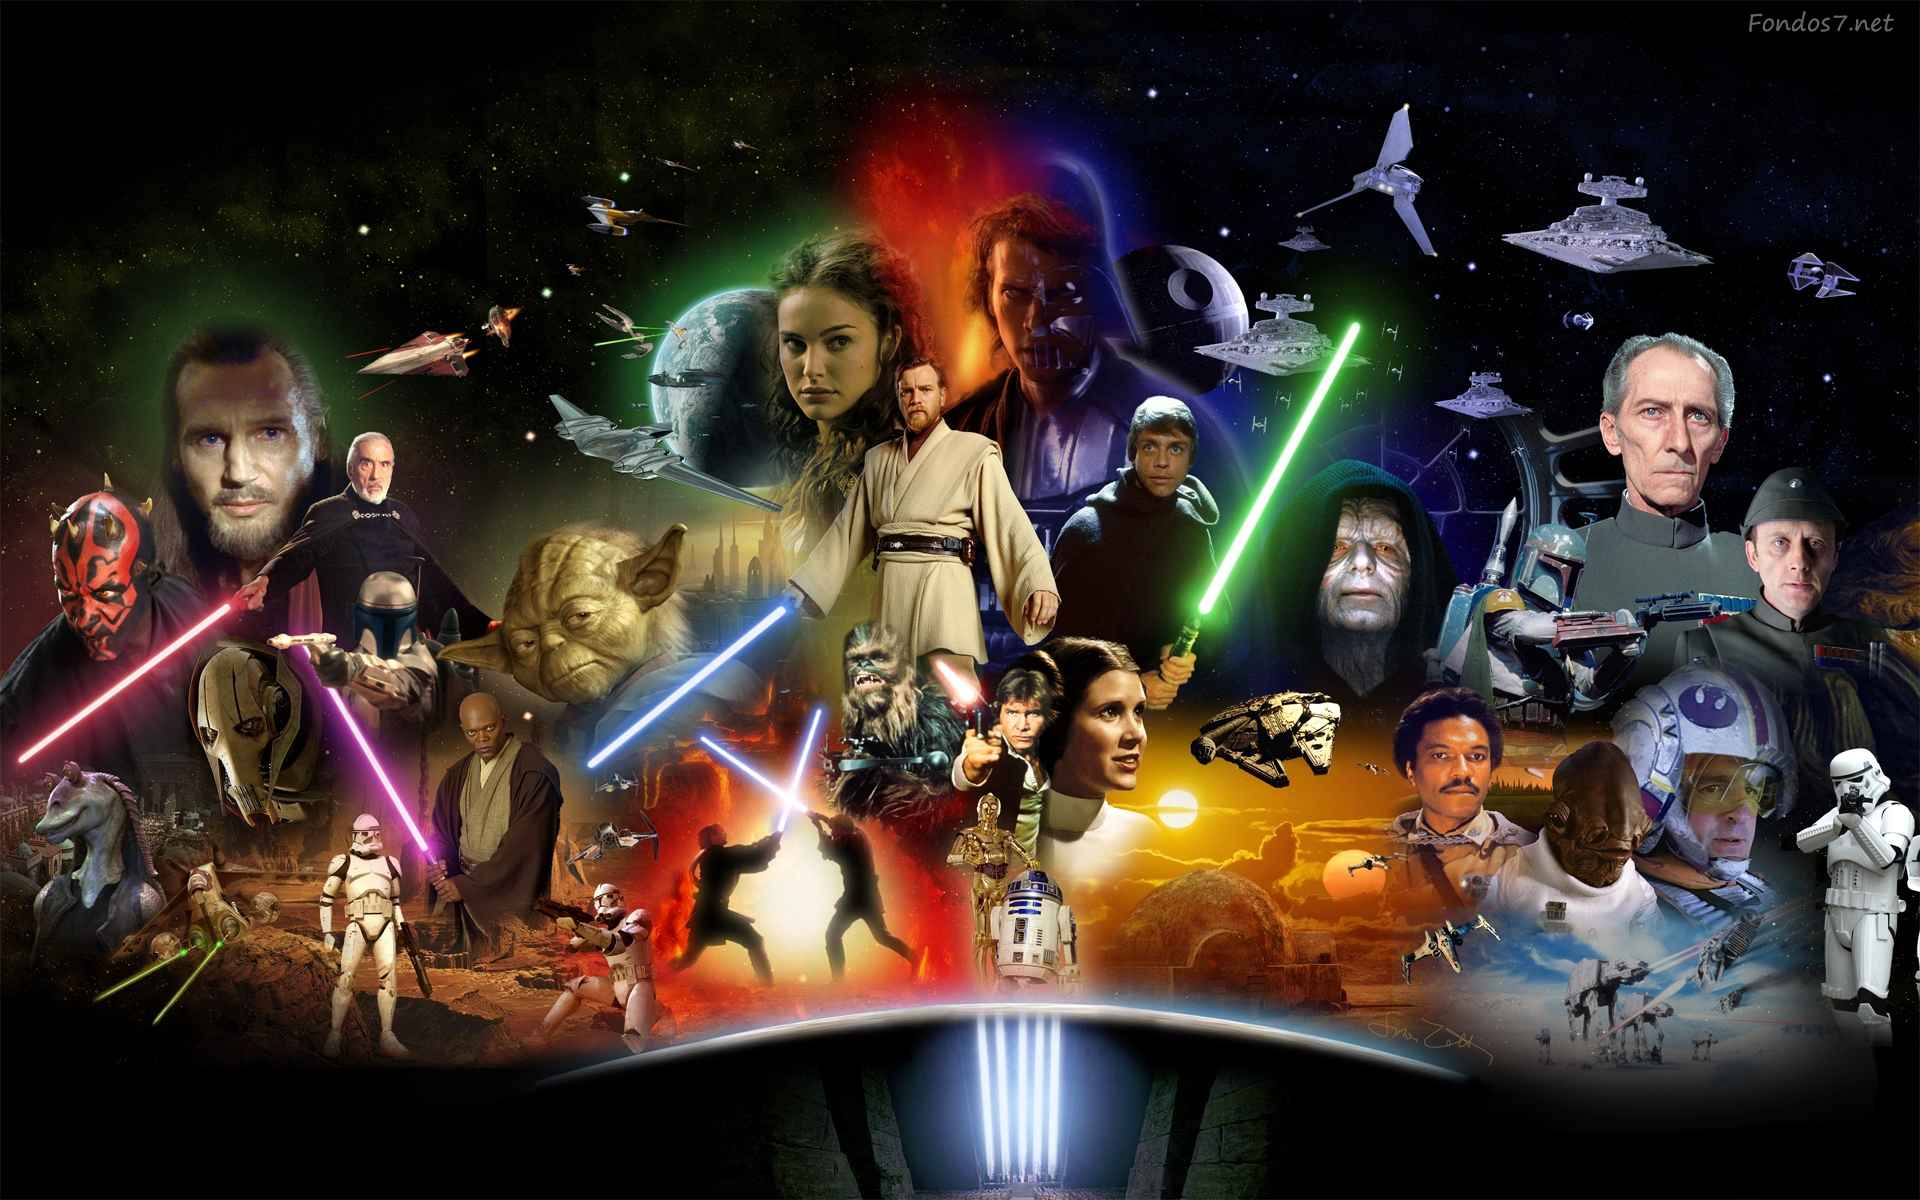 Hoy les traigo Star Wars Wallpapers en 1080p 1920x1200